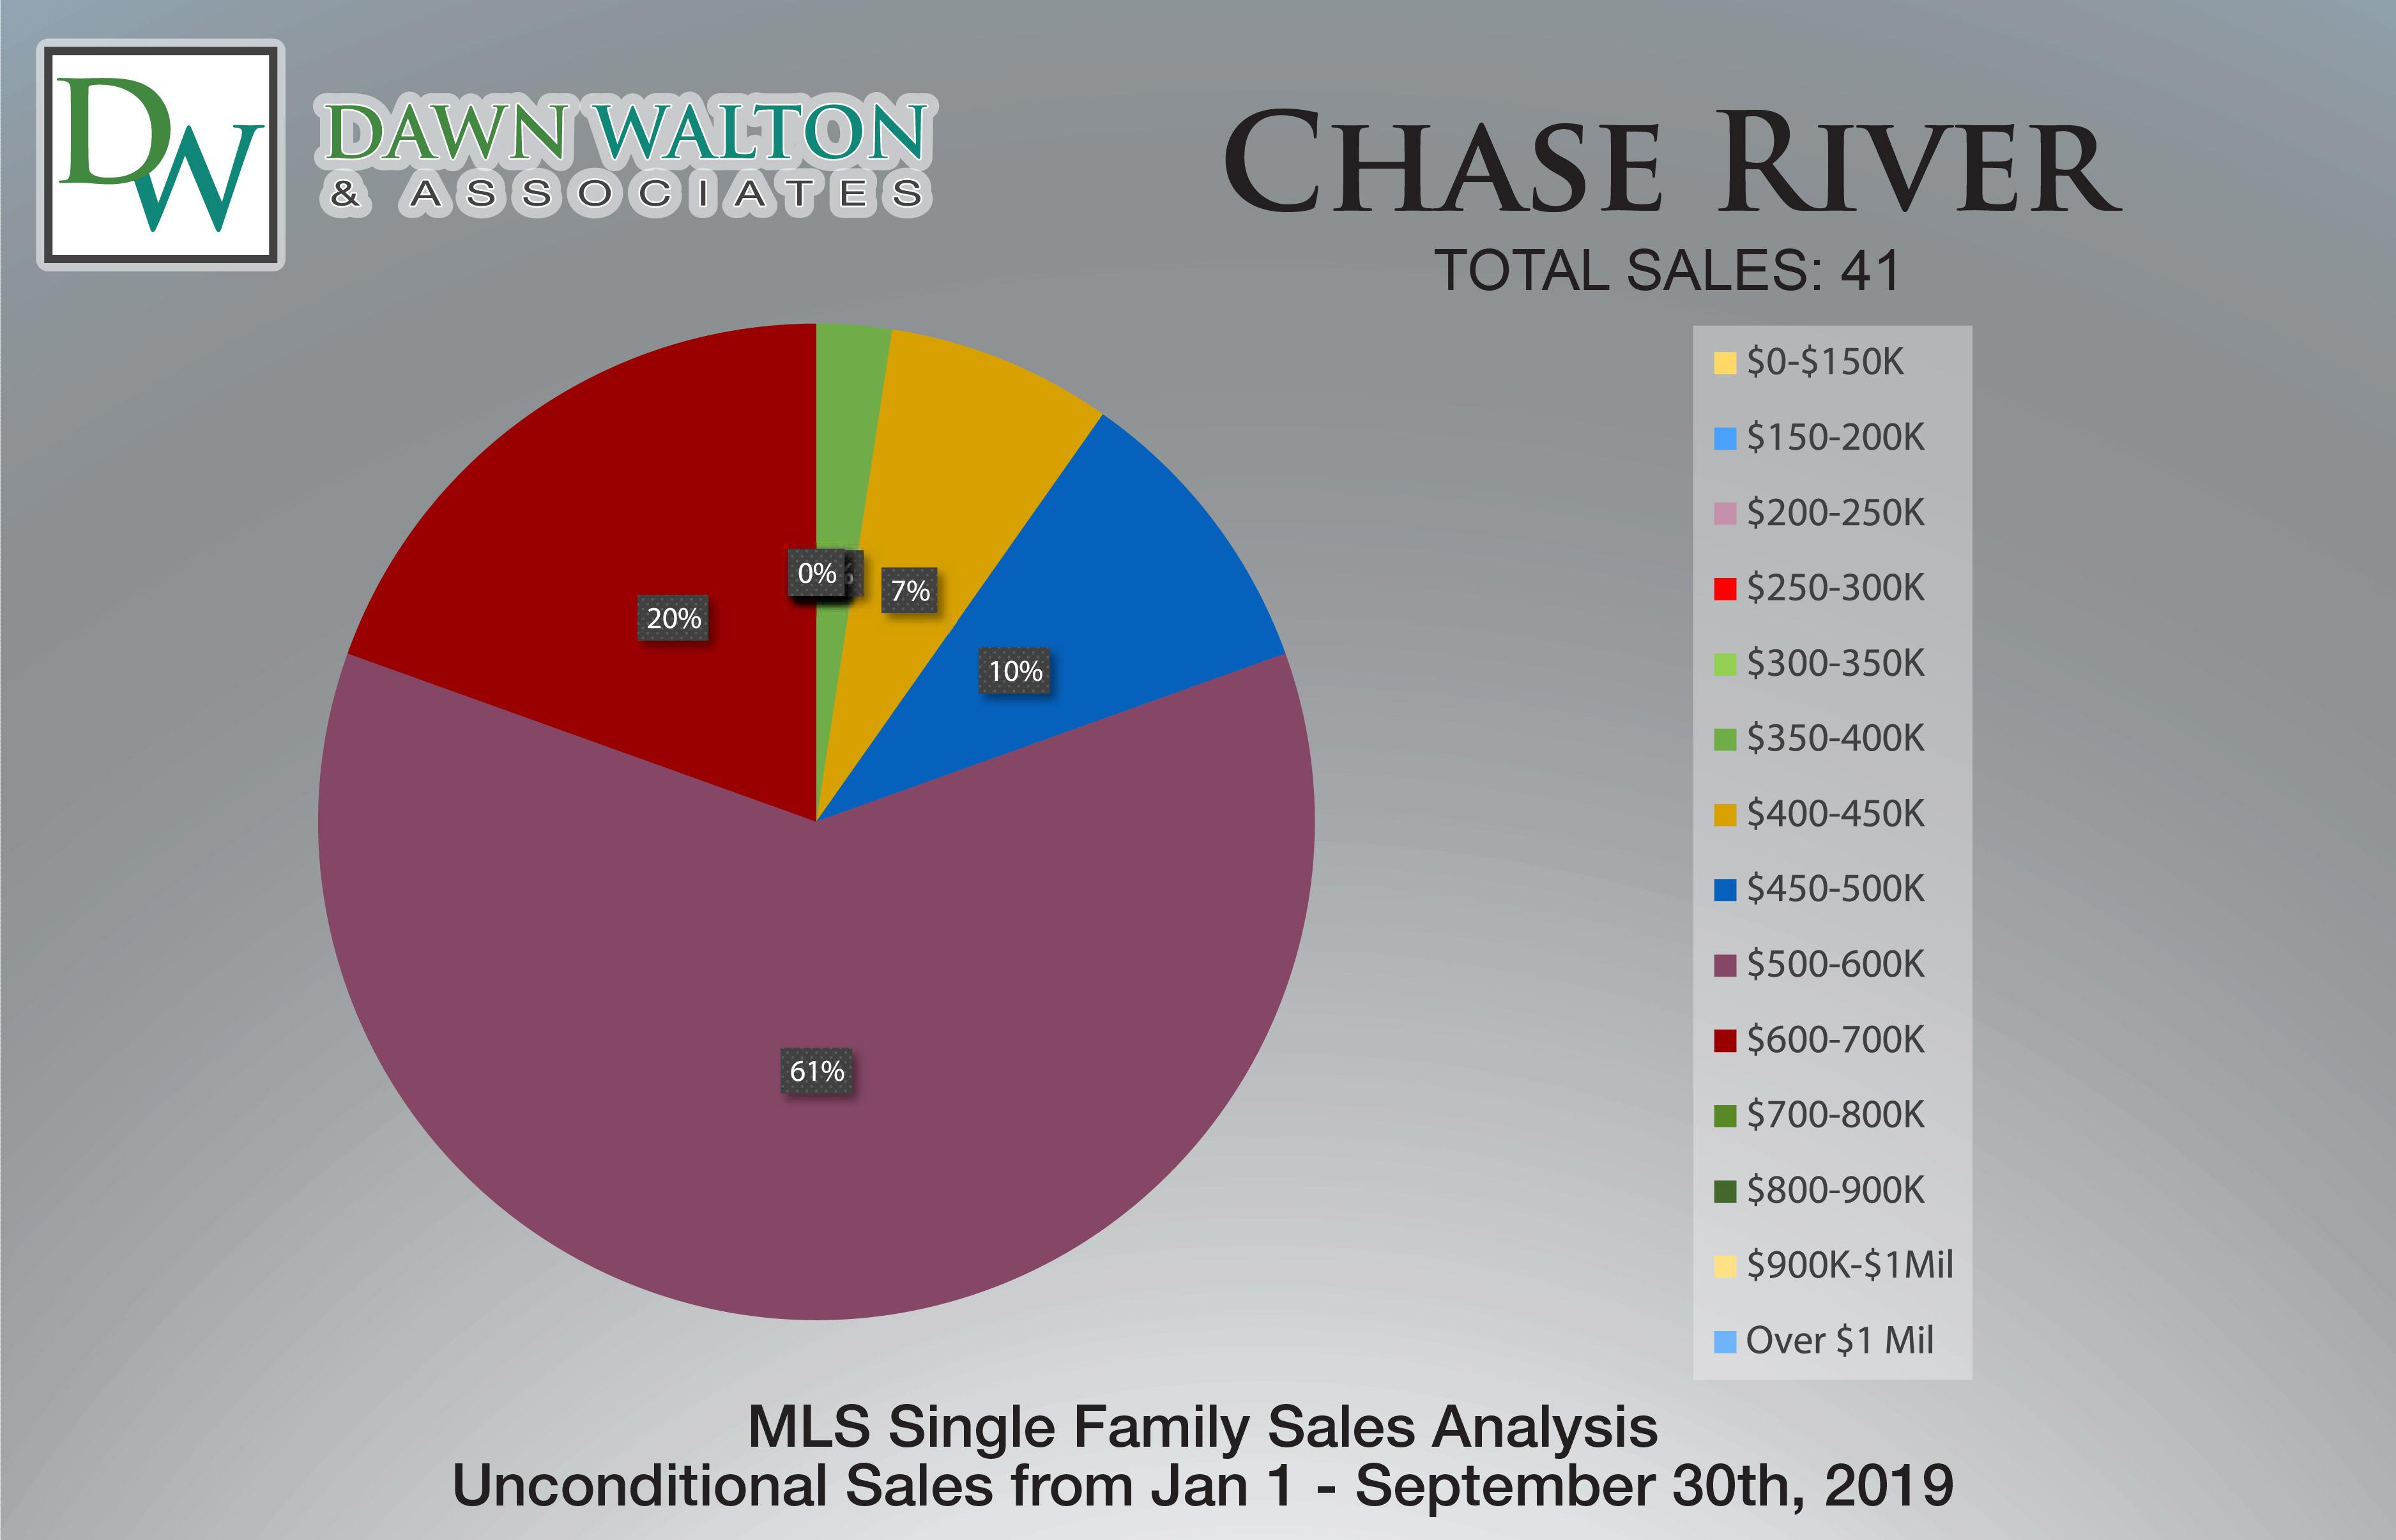 Chase River Real Estate Market Stats Price Percentage Jan 1-Sept 30 2019 - Nanaimo Realtor Dawn Walton